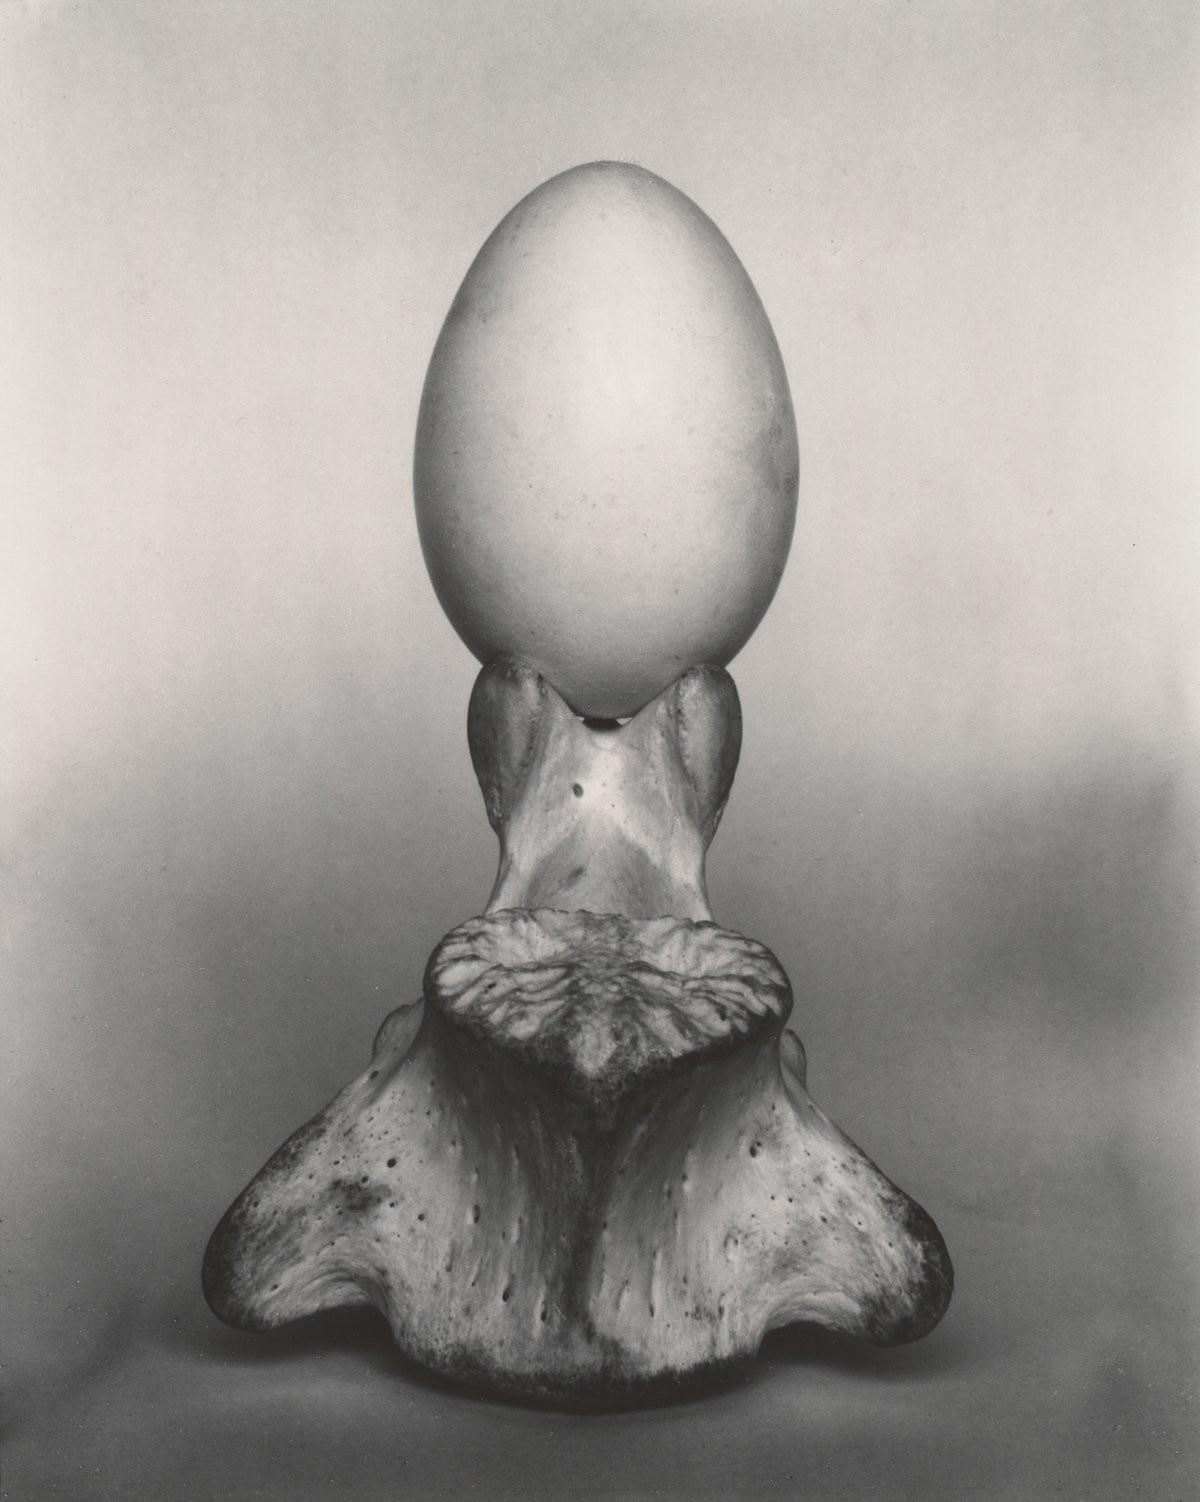 Яйцо на кости, 1930. Фотограф Эдвард Уэстон